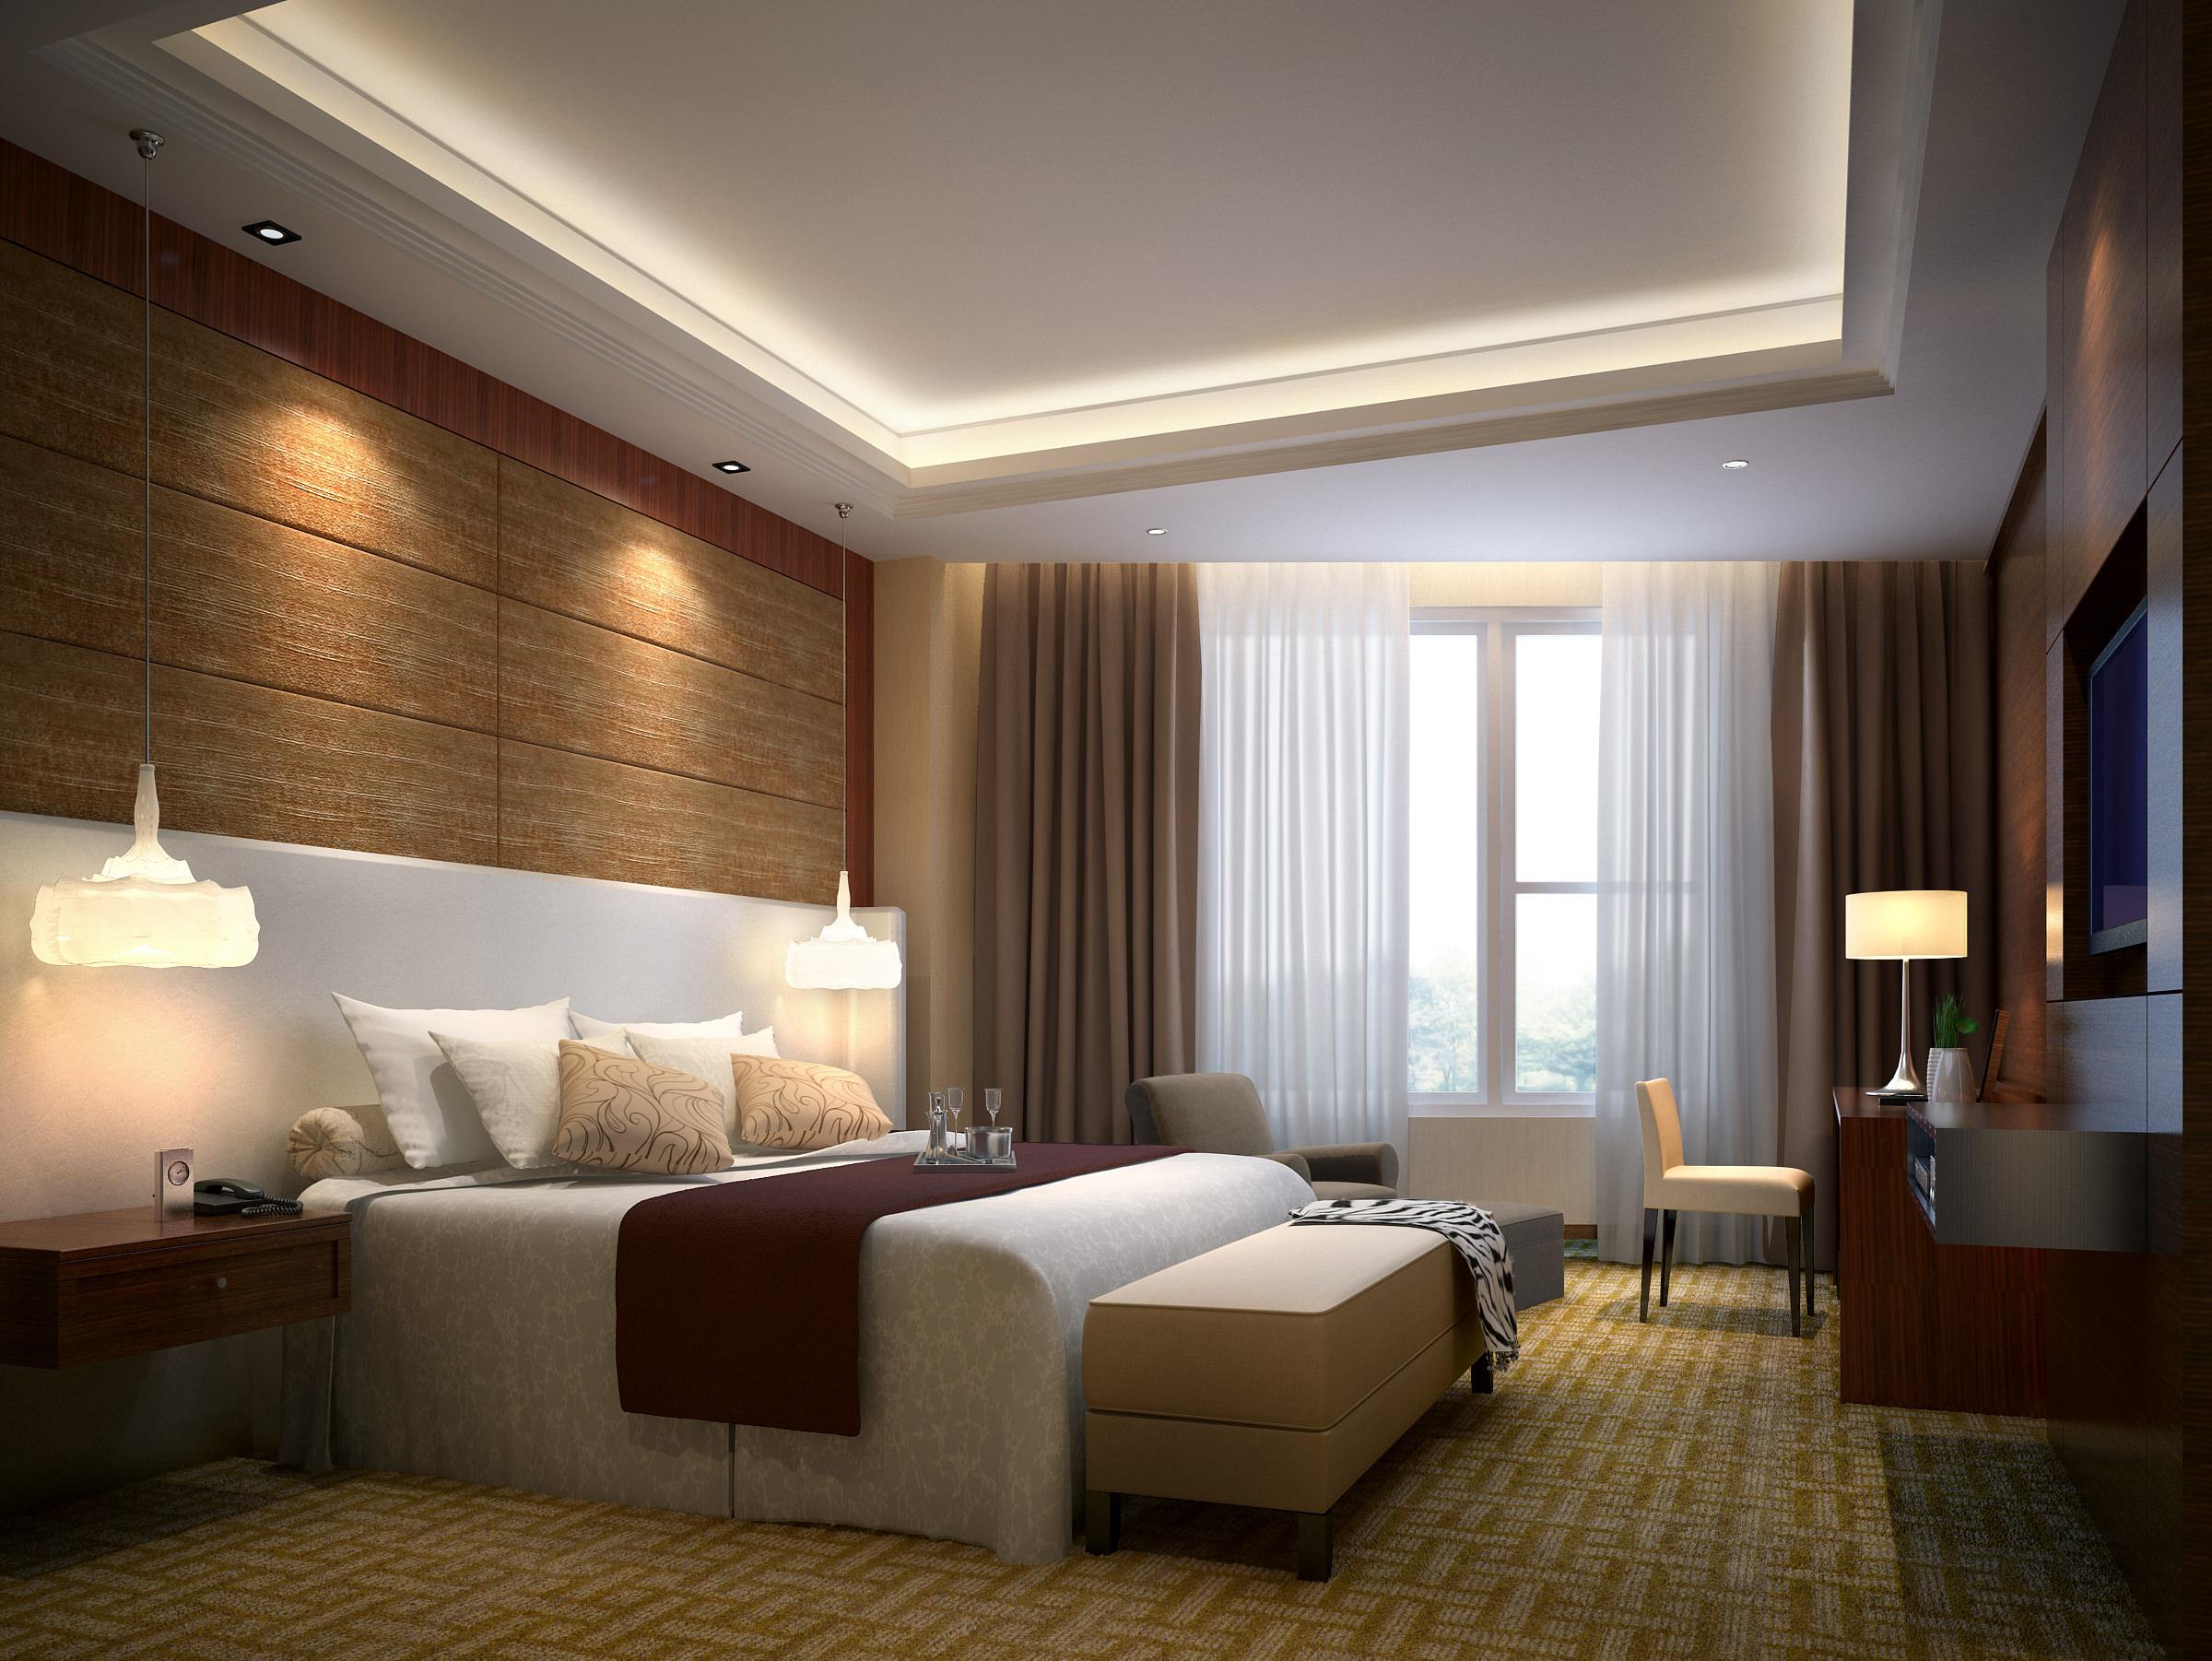 Bedroom 3D Design hotel bedroom 3d model couch | cgtrader